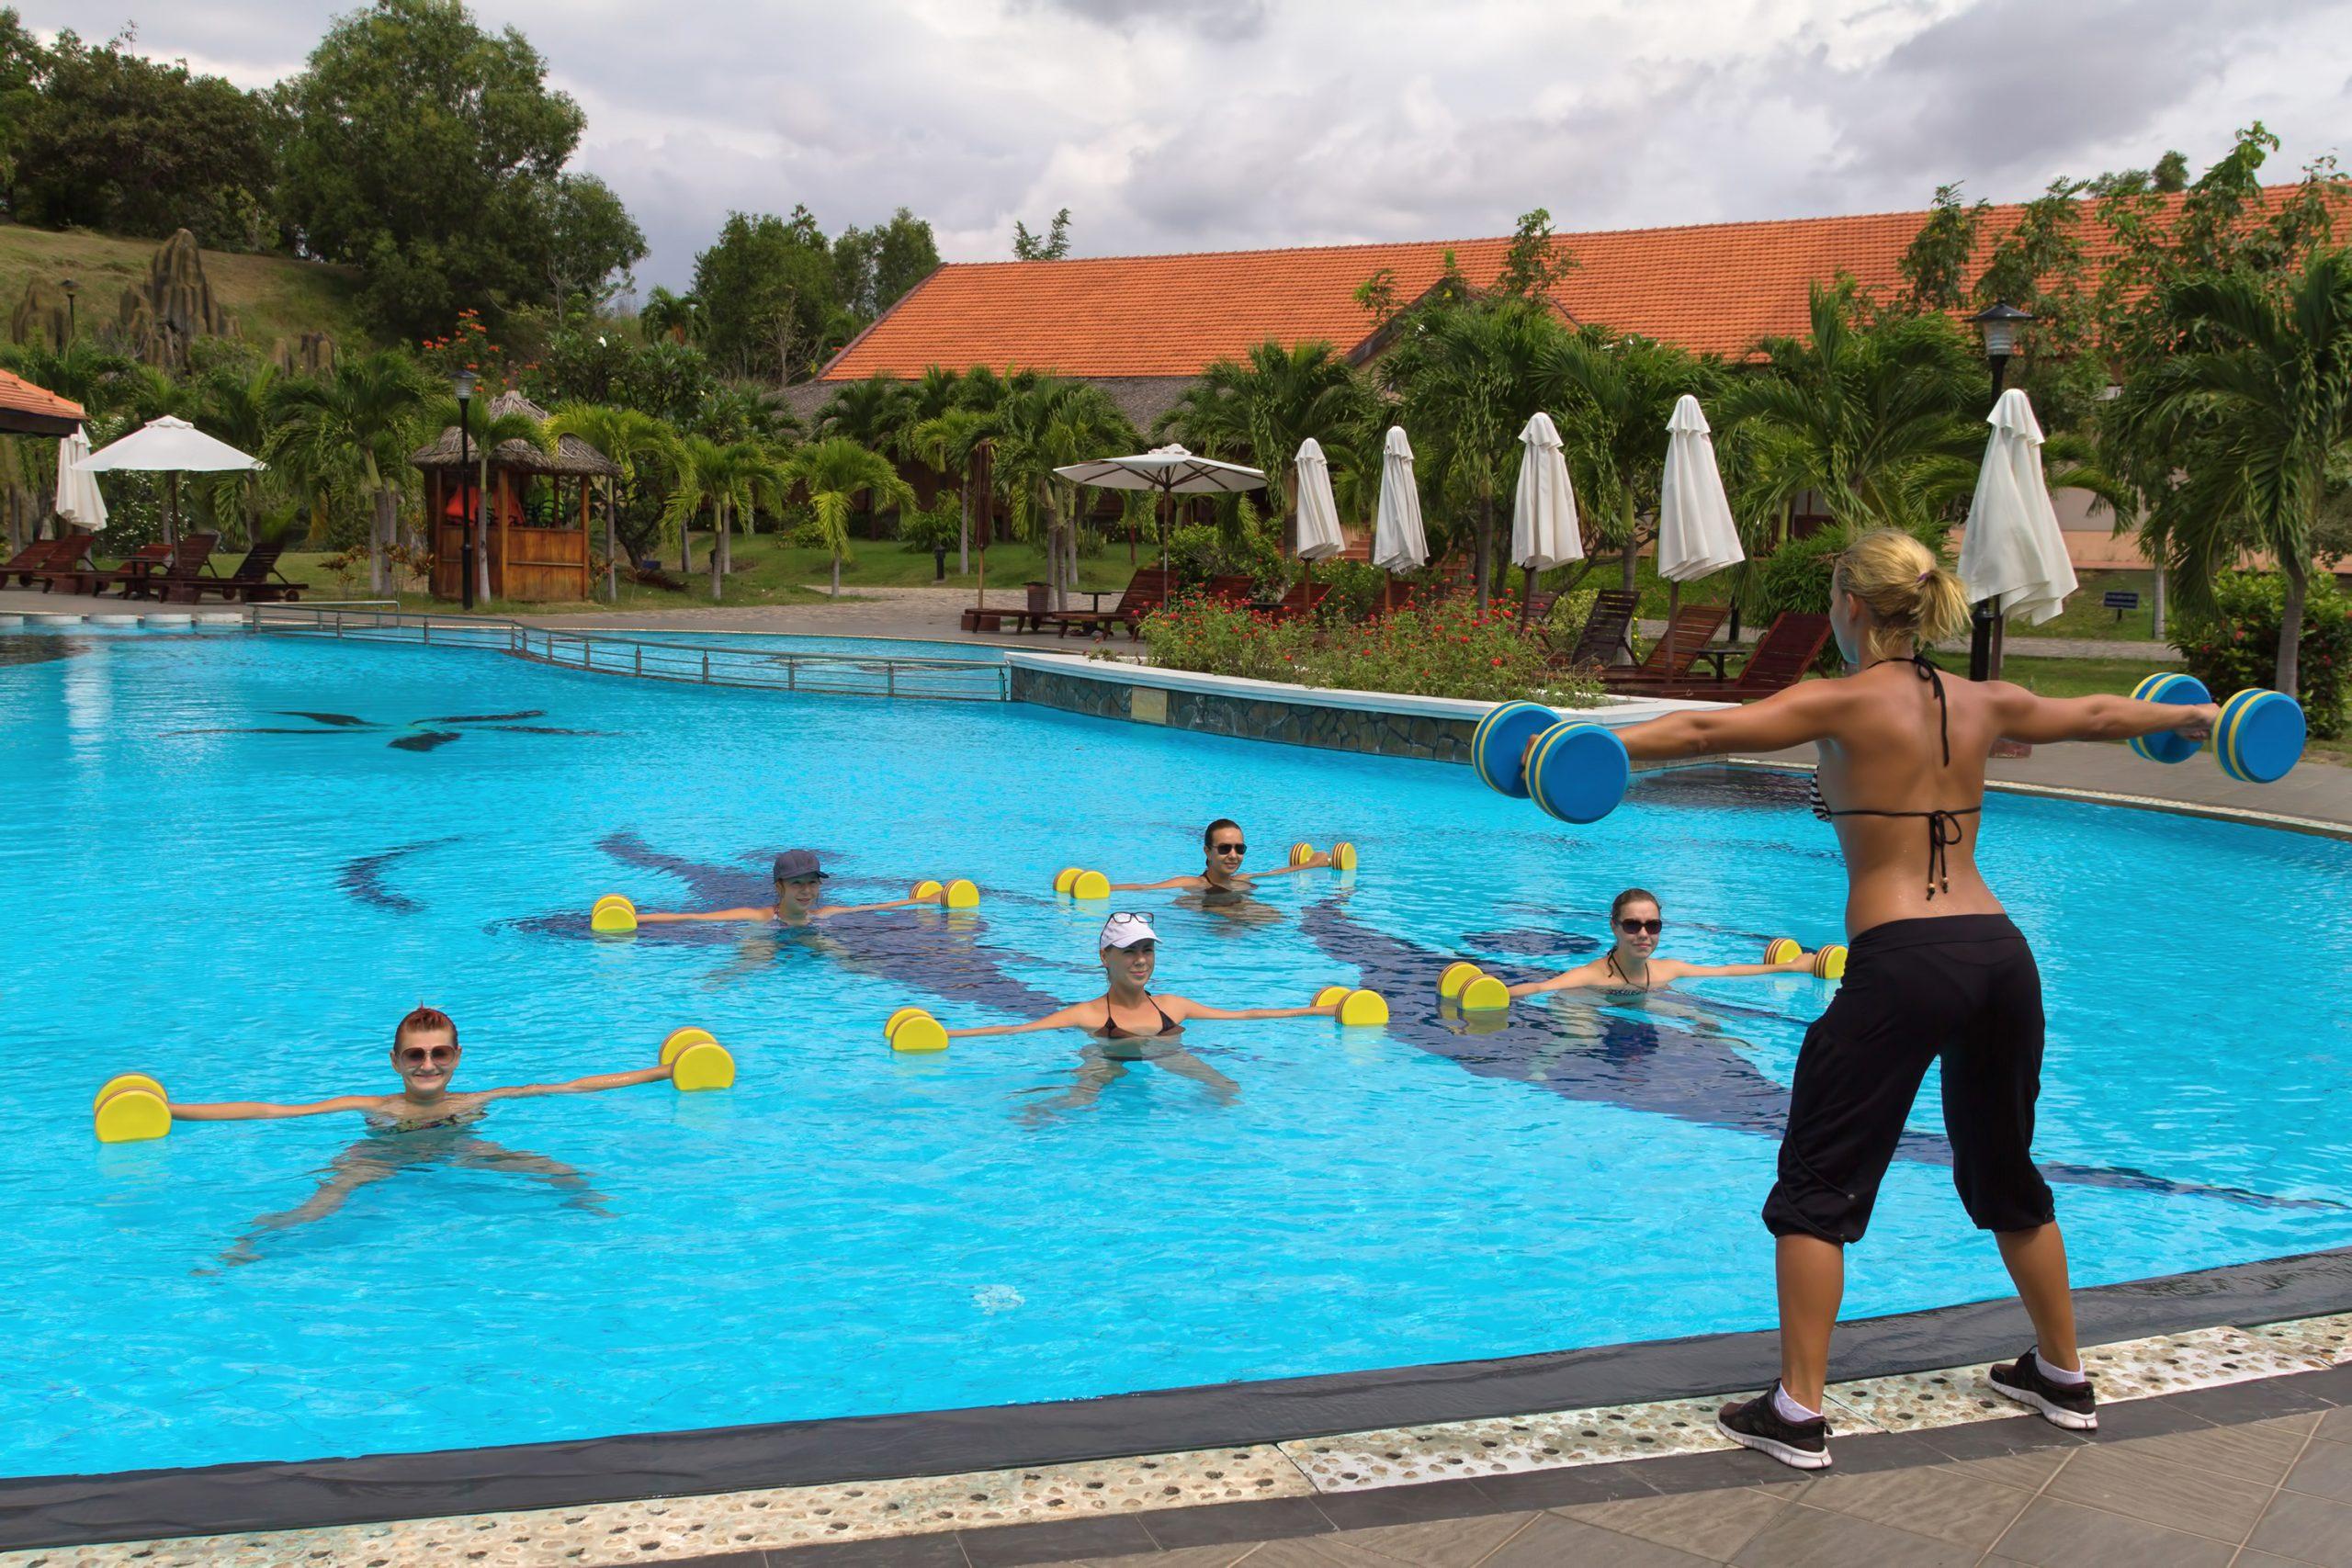 Šport Aqua fitness